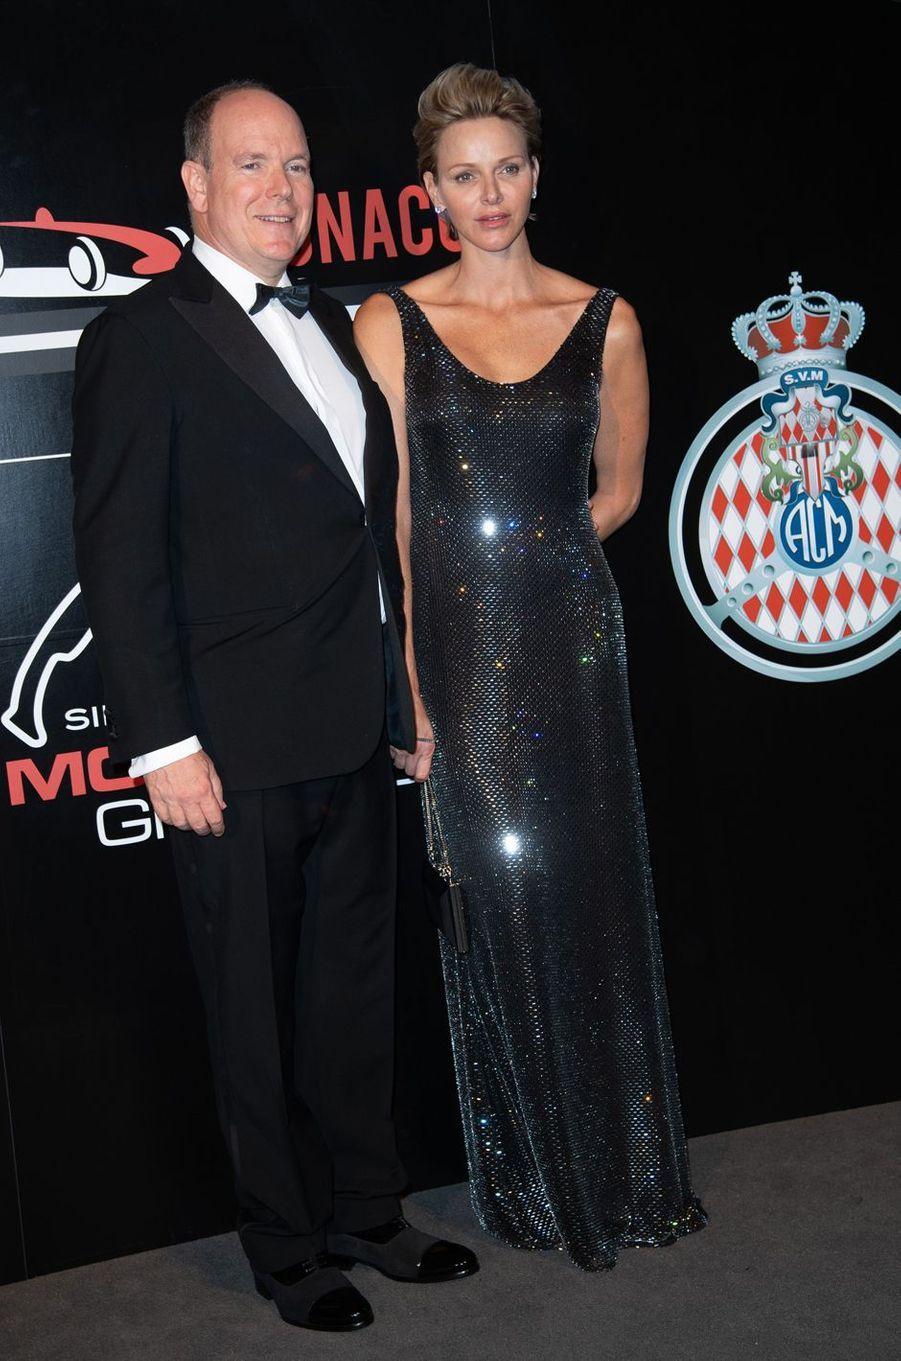 La princesse Charlène de Monaco en Ralph Lauren, le 27 mai 2018